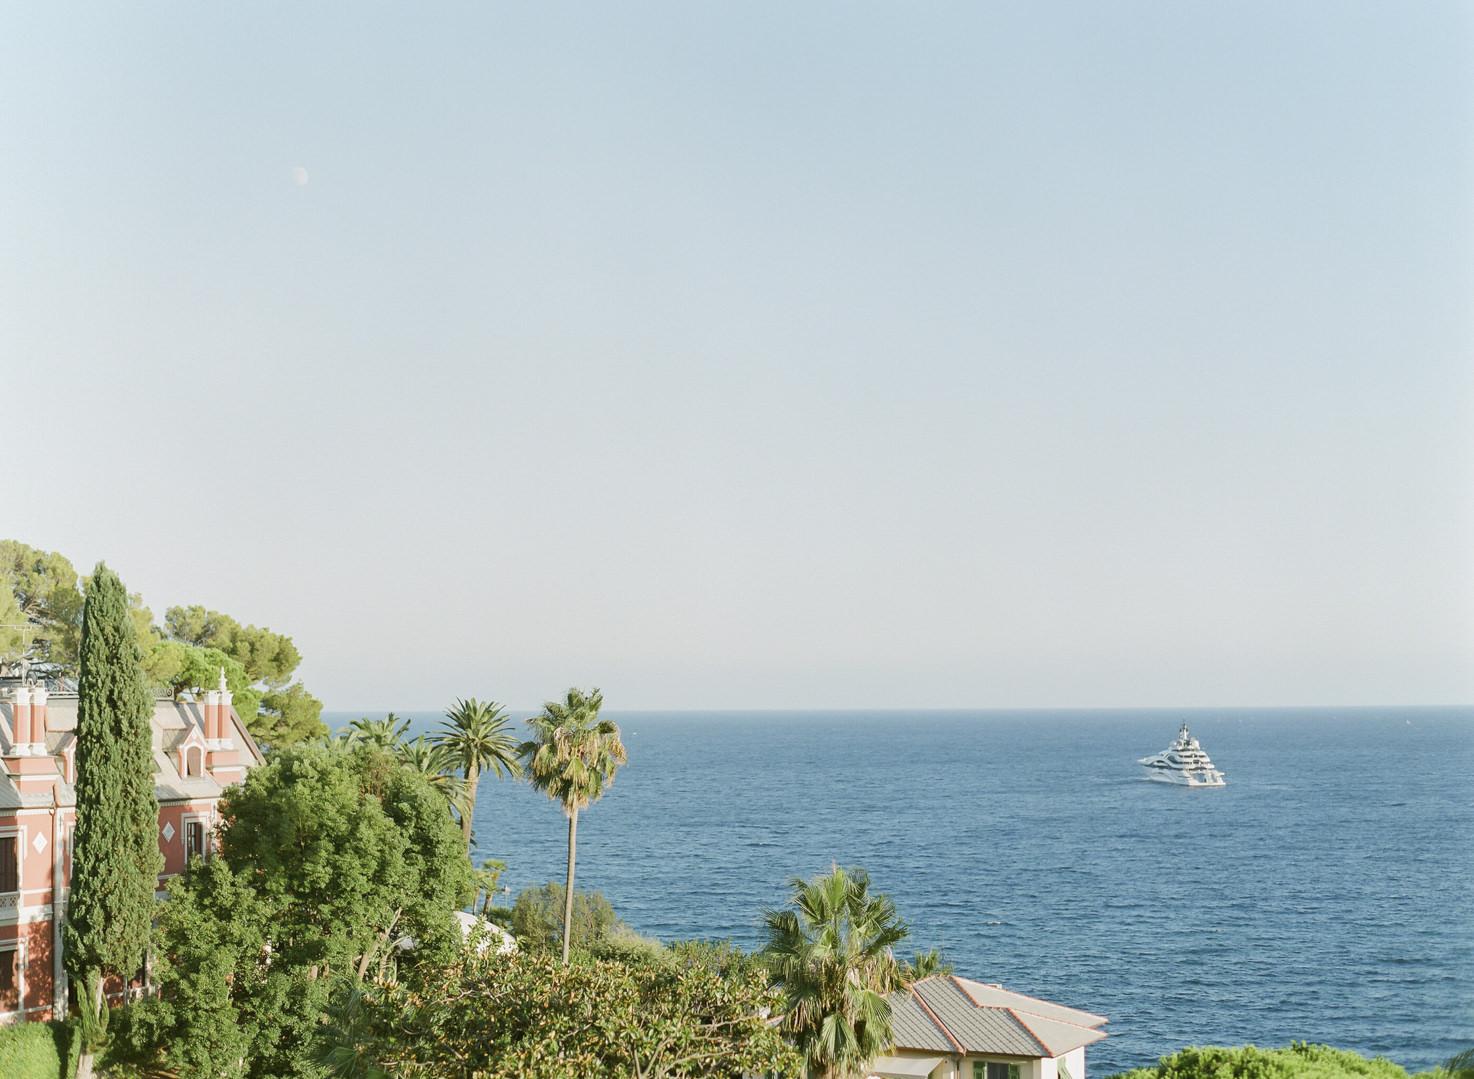 Panorama of the Italian Riviera Ligure